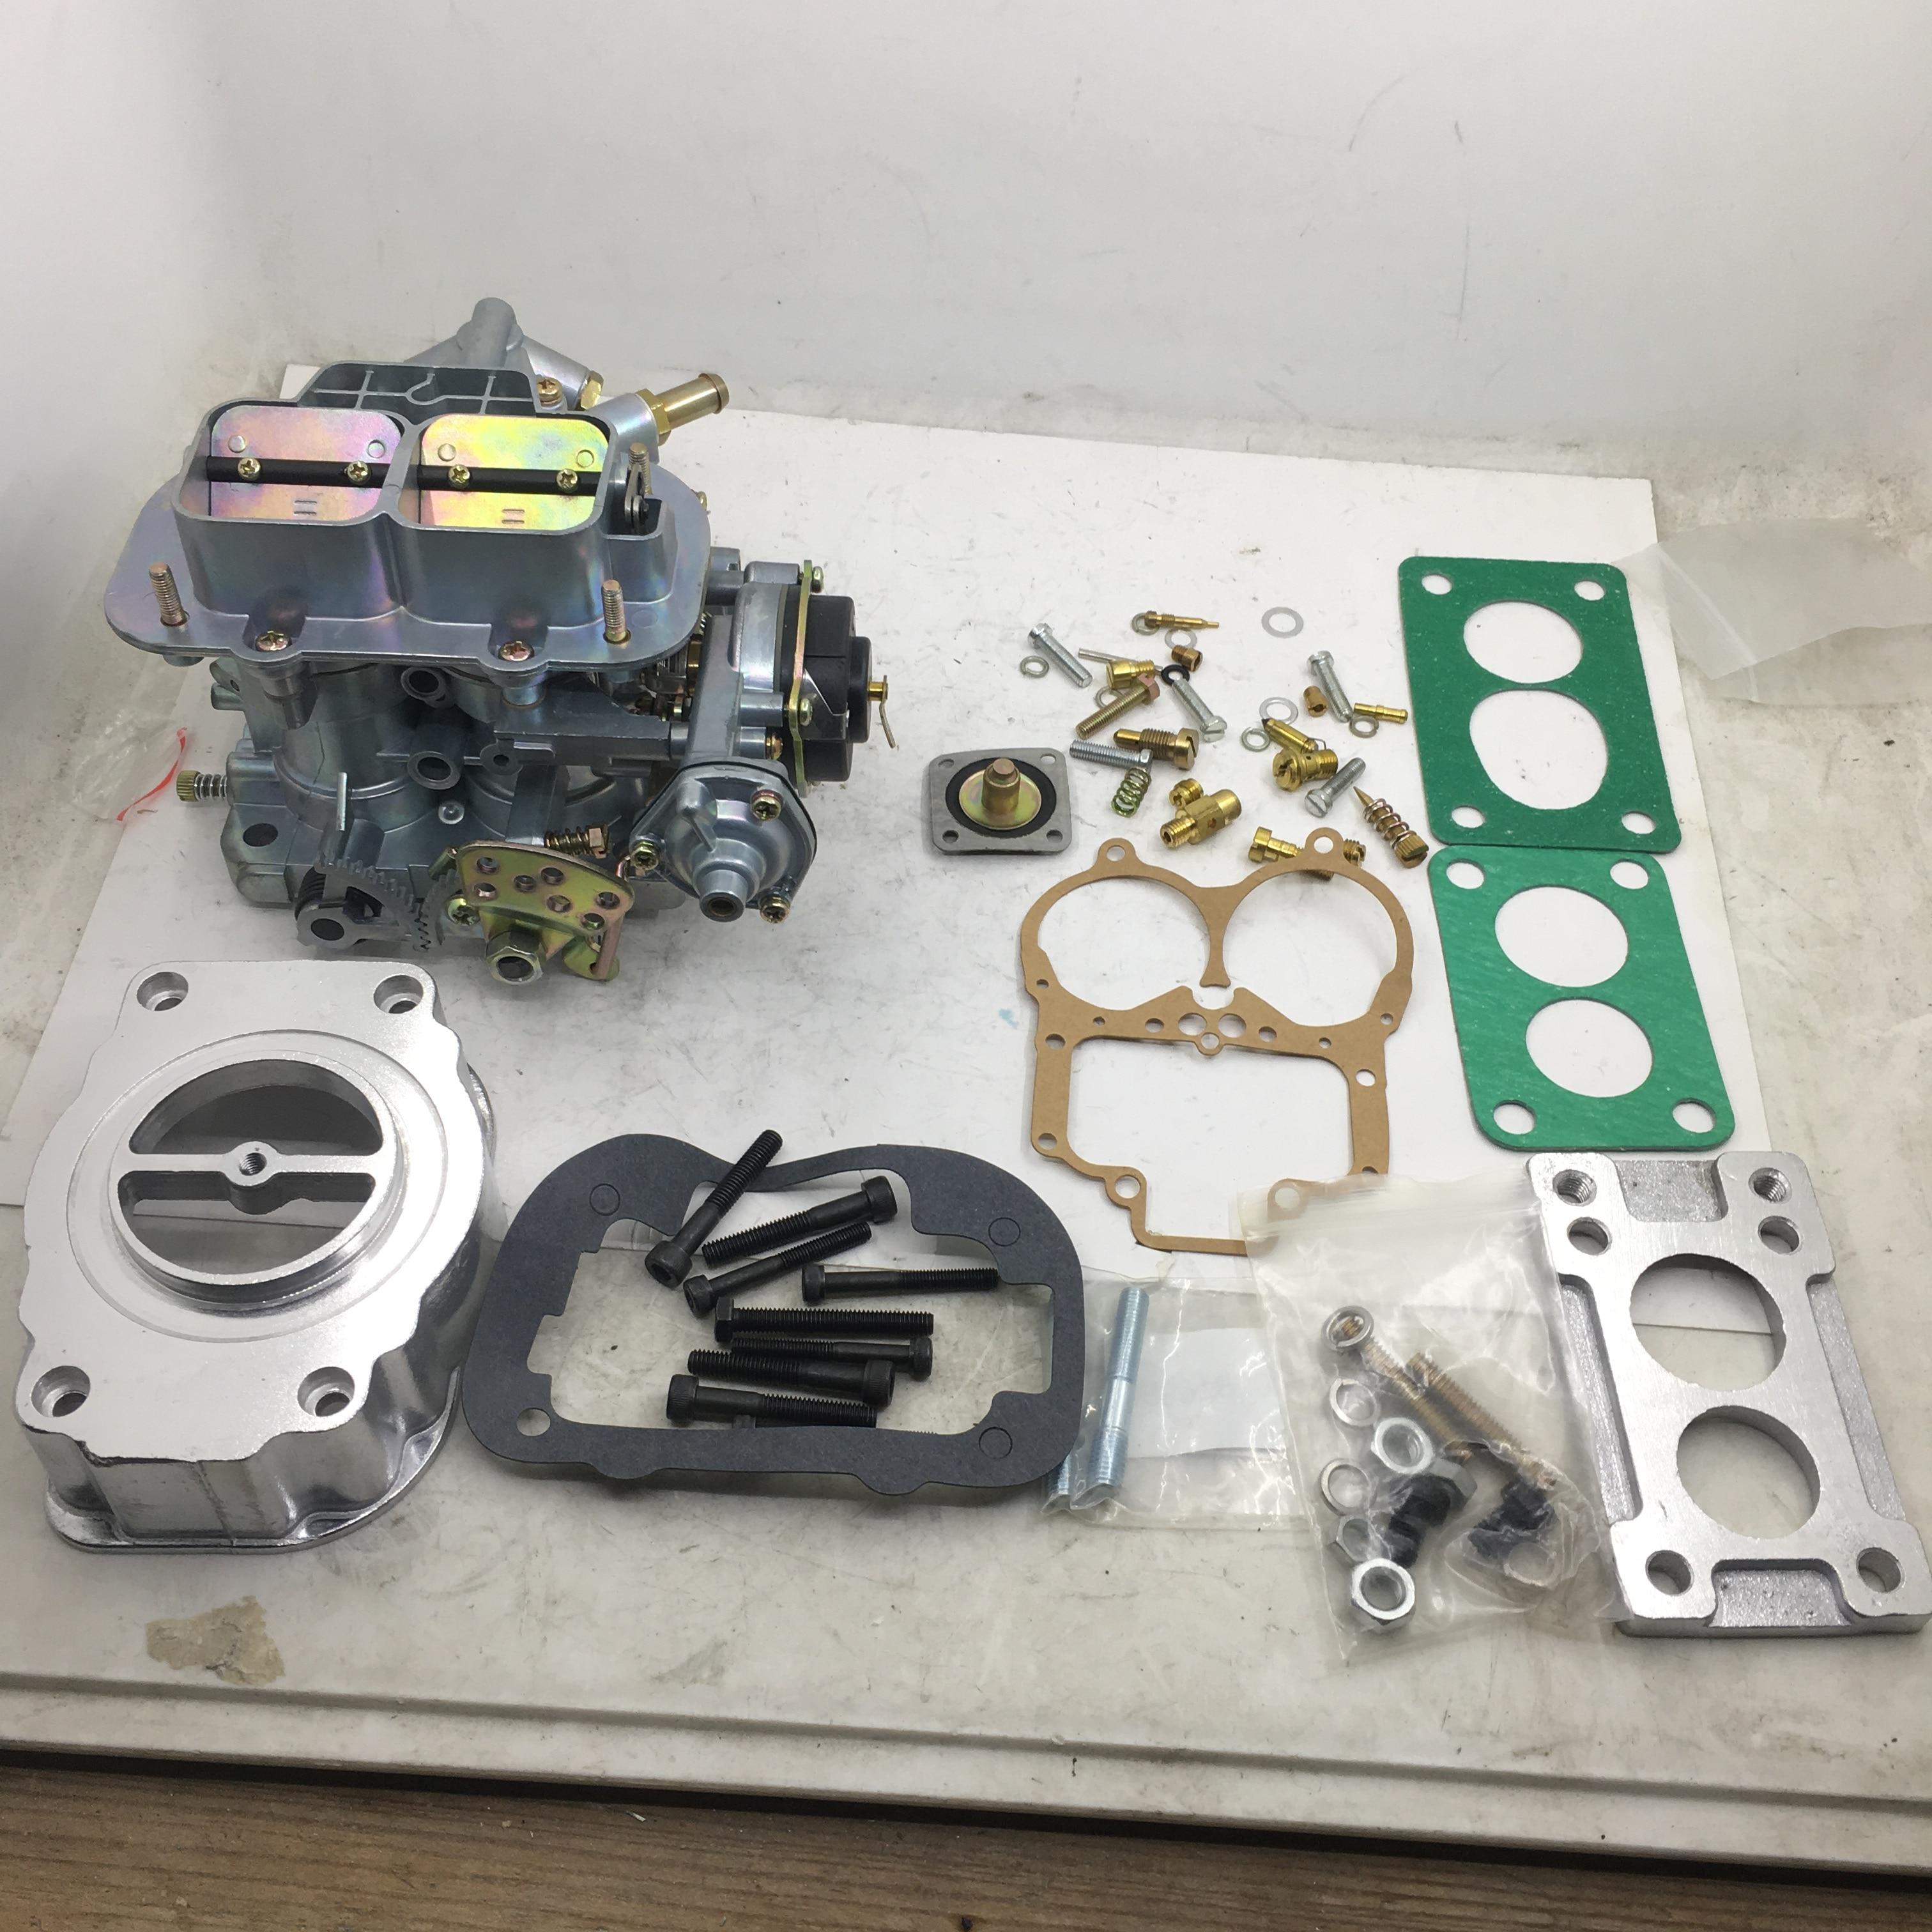 SherryBerg 38x38 FAJS/38/38 los GED carburador + Adaptador + filtro de aire adaptador para Fiat renault FORD VW BMW 390 CFM BMW DAEWOO DODGE